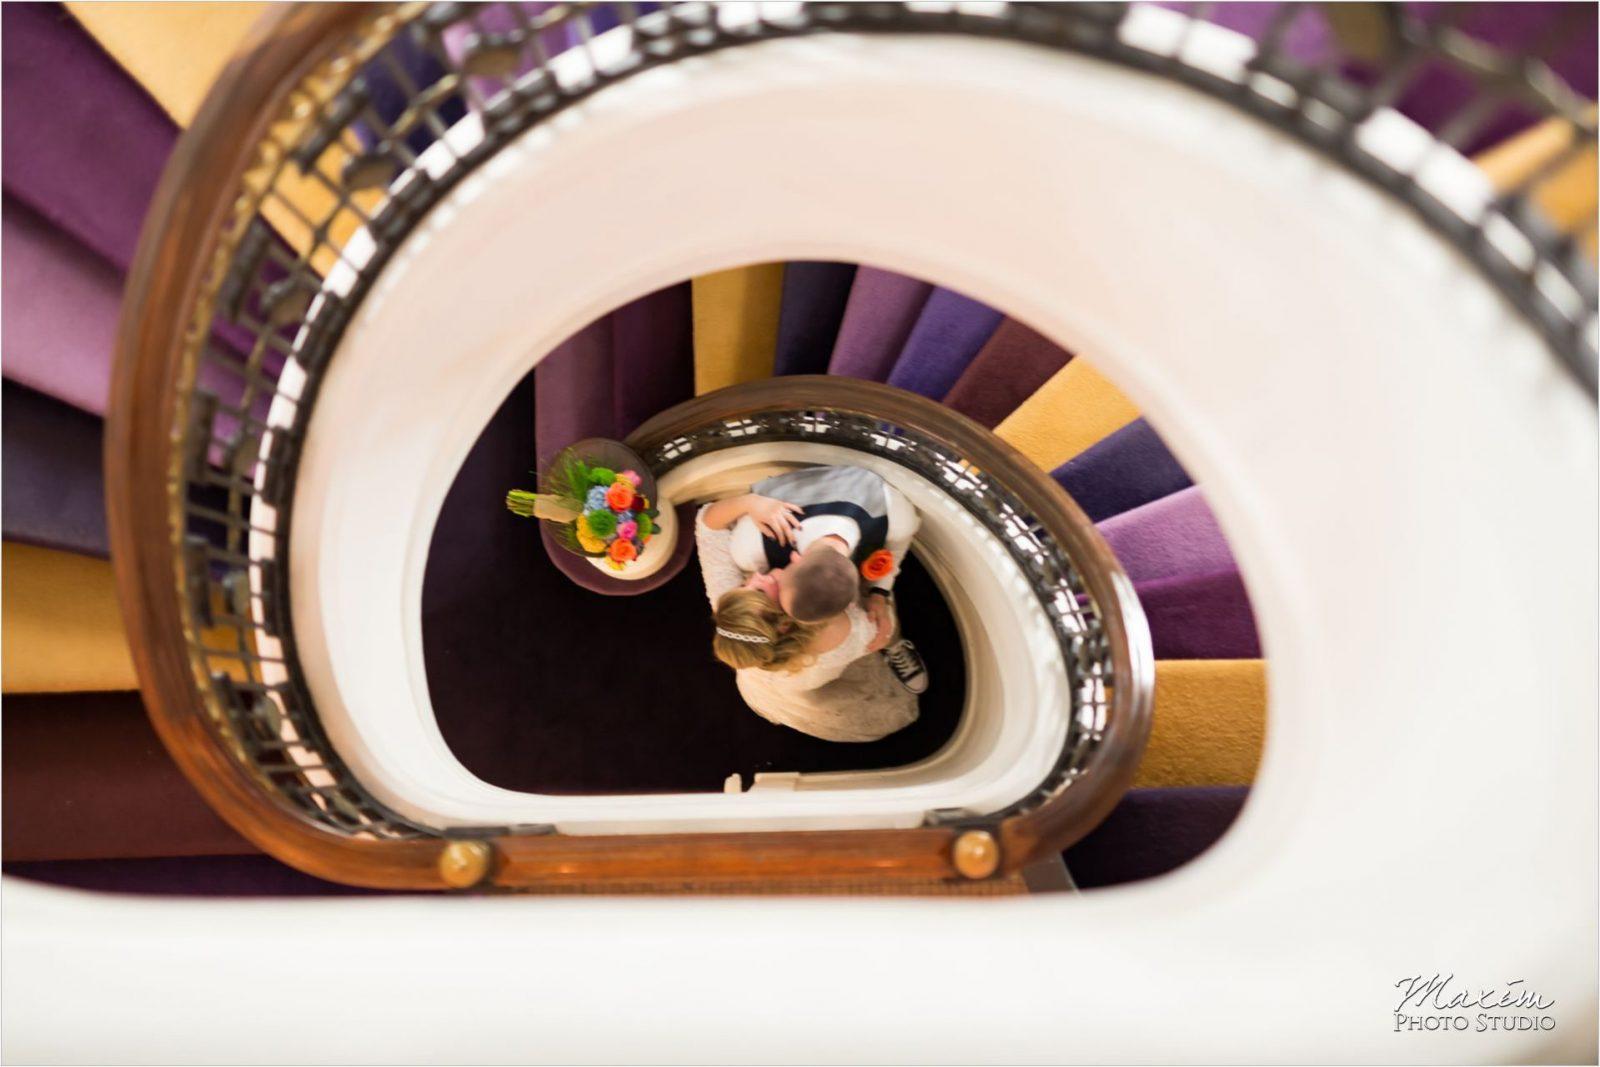 21C Museum Hotel Cincinnati Bride Groom